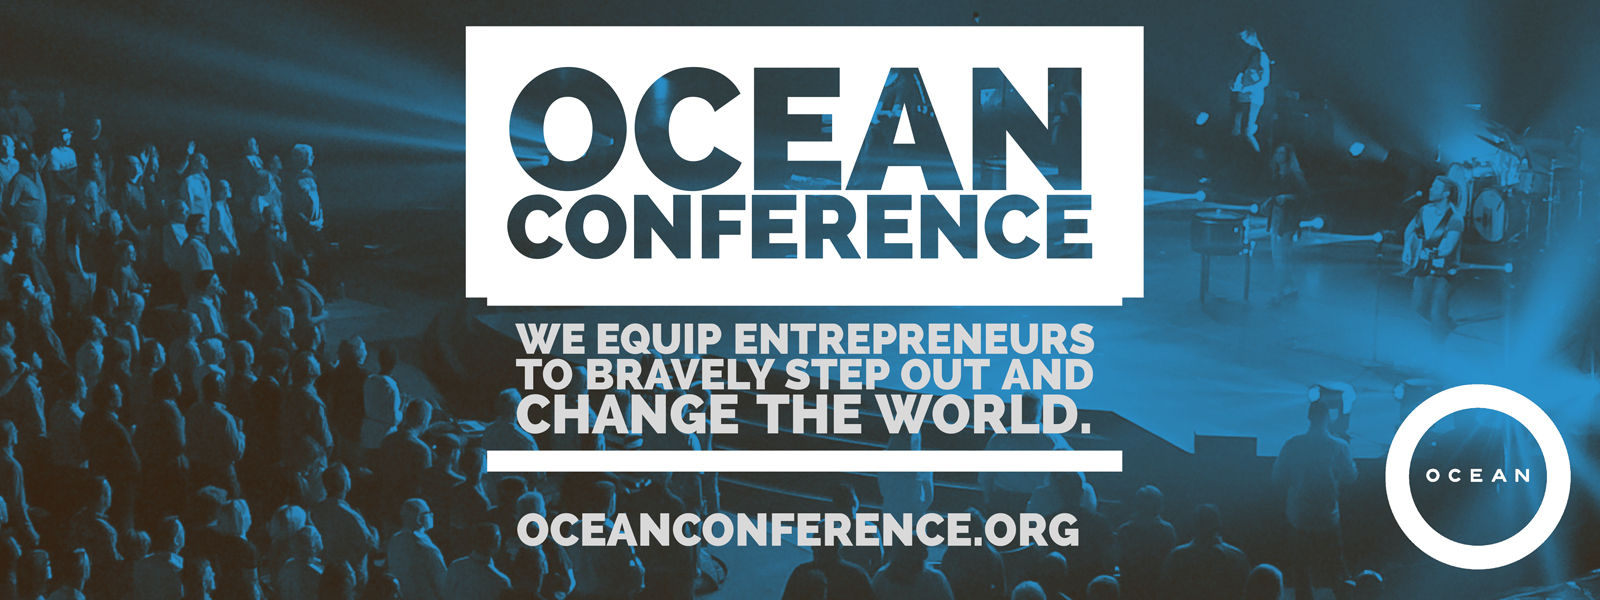 OCEAN Conference 2018